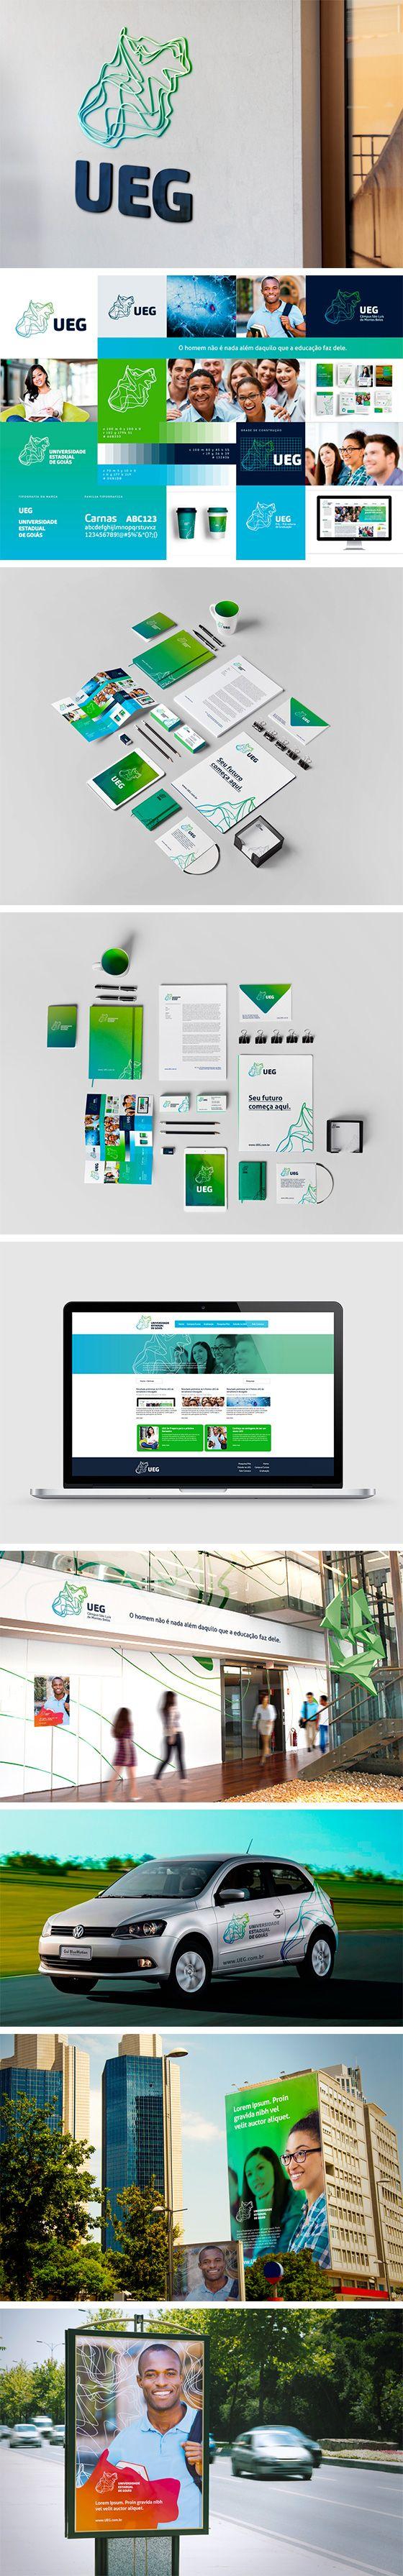 Branding University UEG  #branding #graphicdesign #designgrafico #design